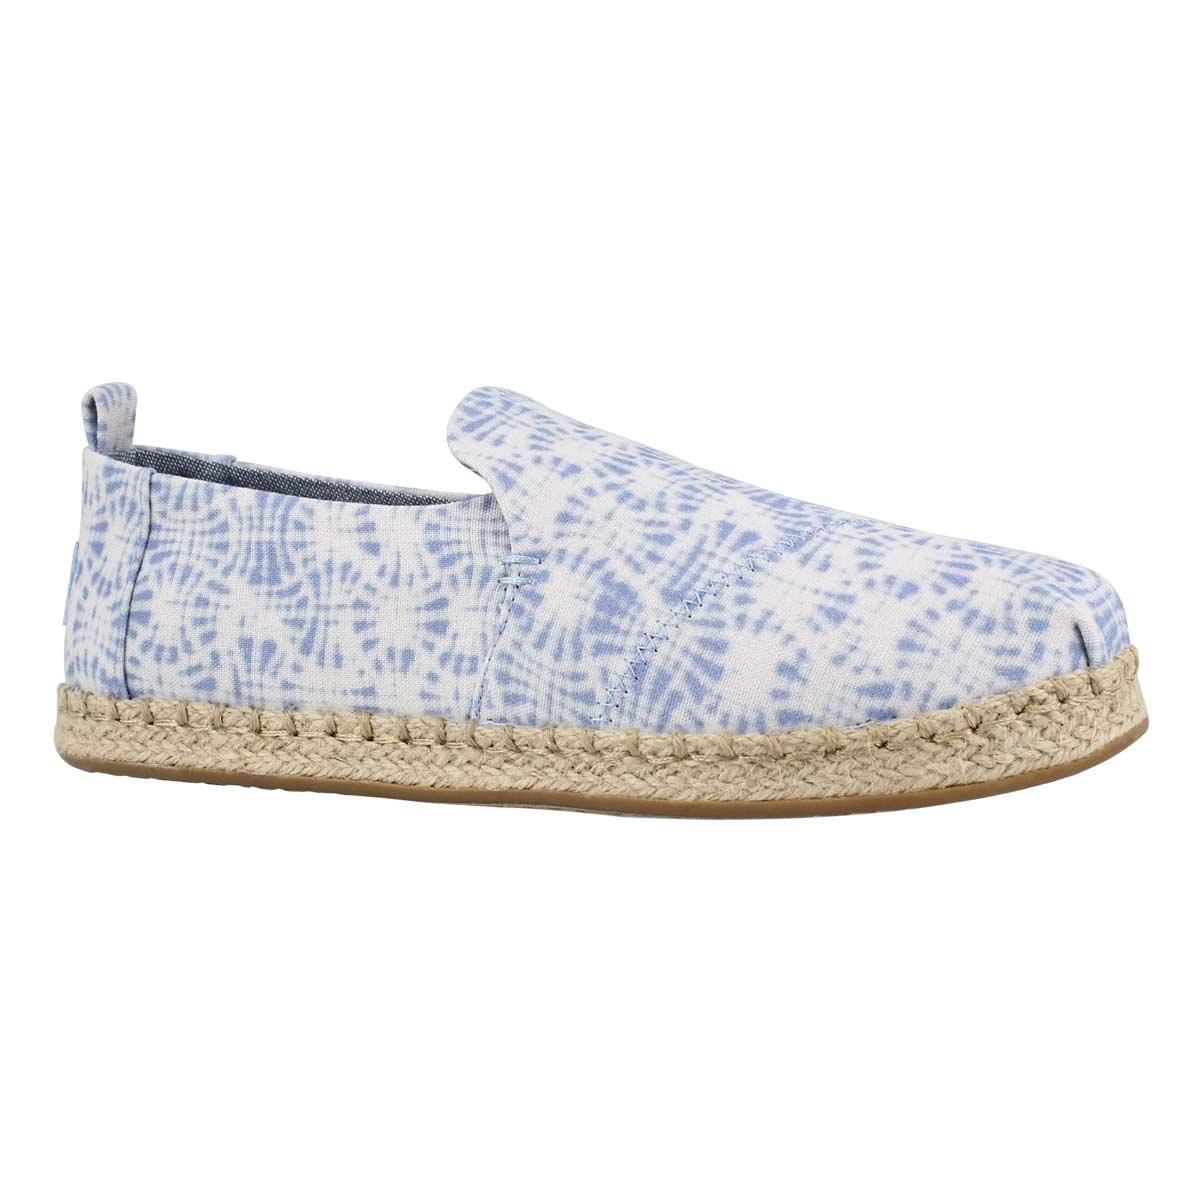 Lds DeconstructedAlpargata wt/blu loafer